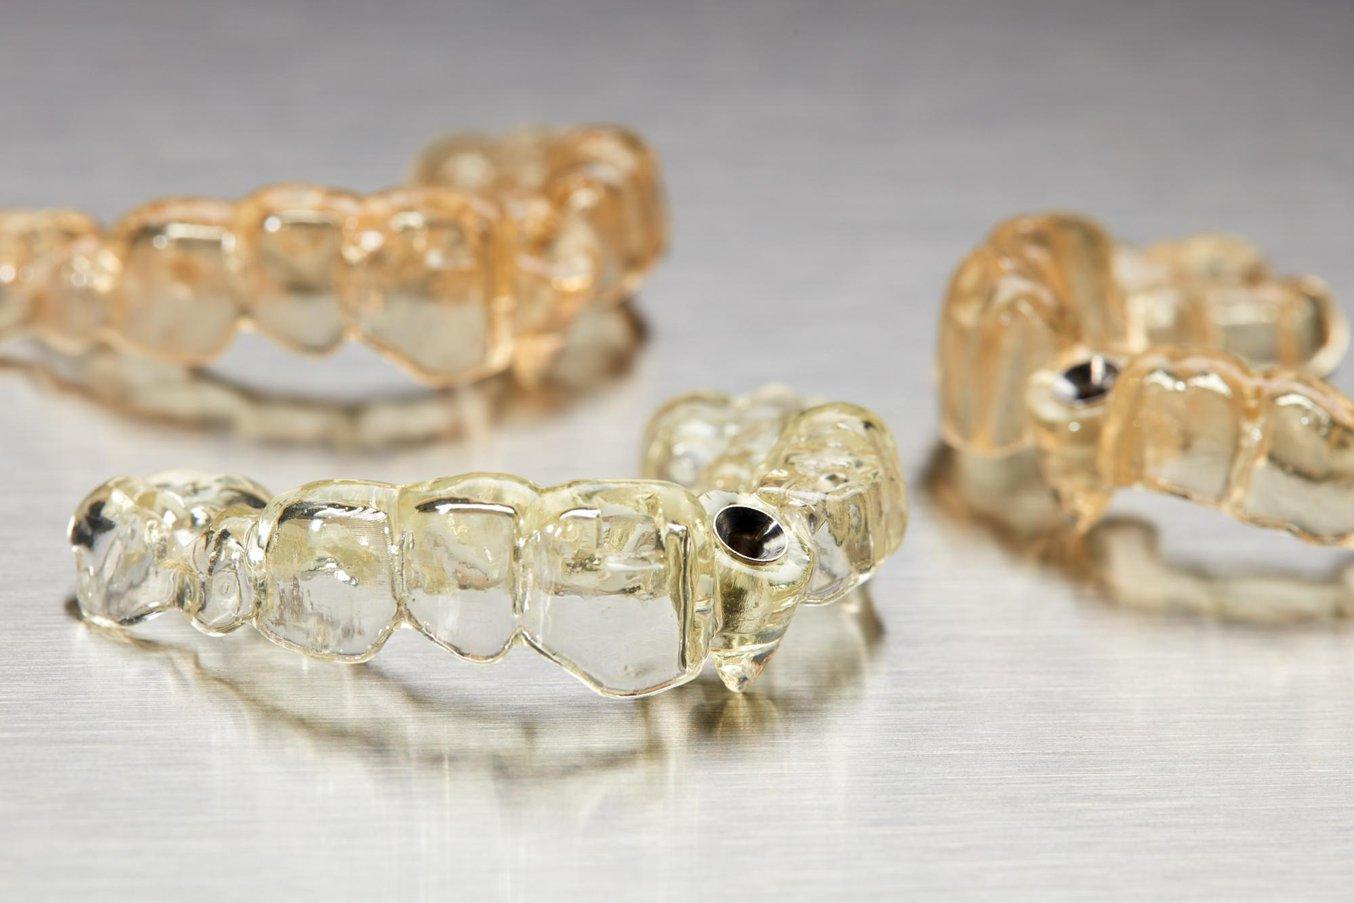 Dime chirurgiche stampate in 3D su una stampante 3D dentale Form 3B di Formlabs.